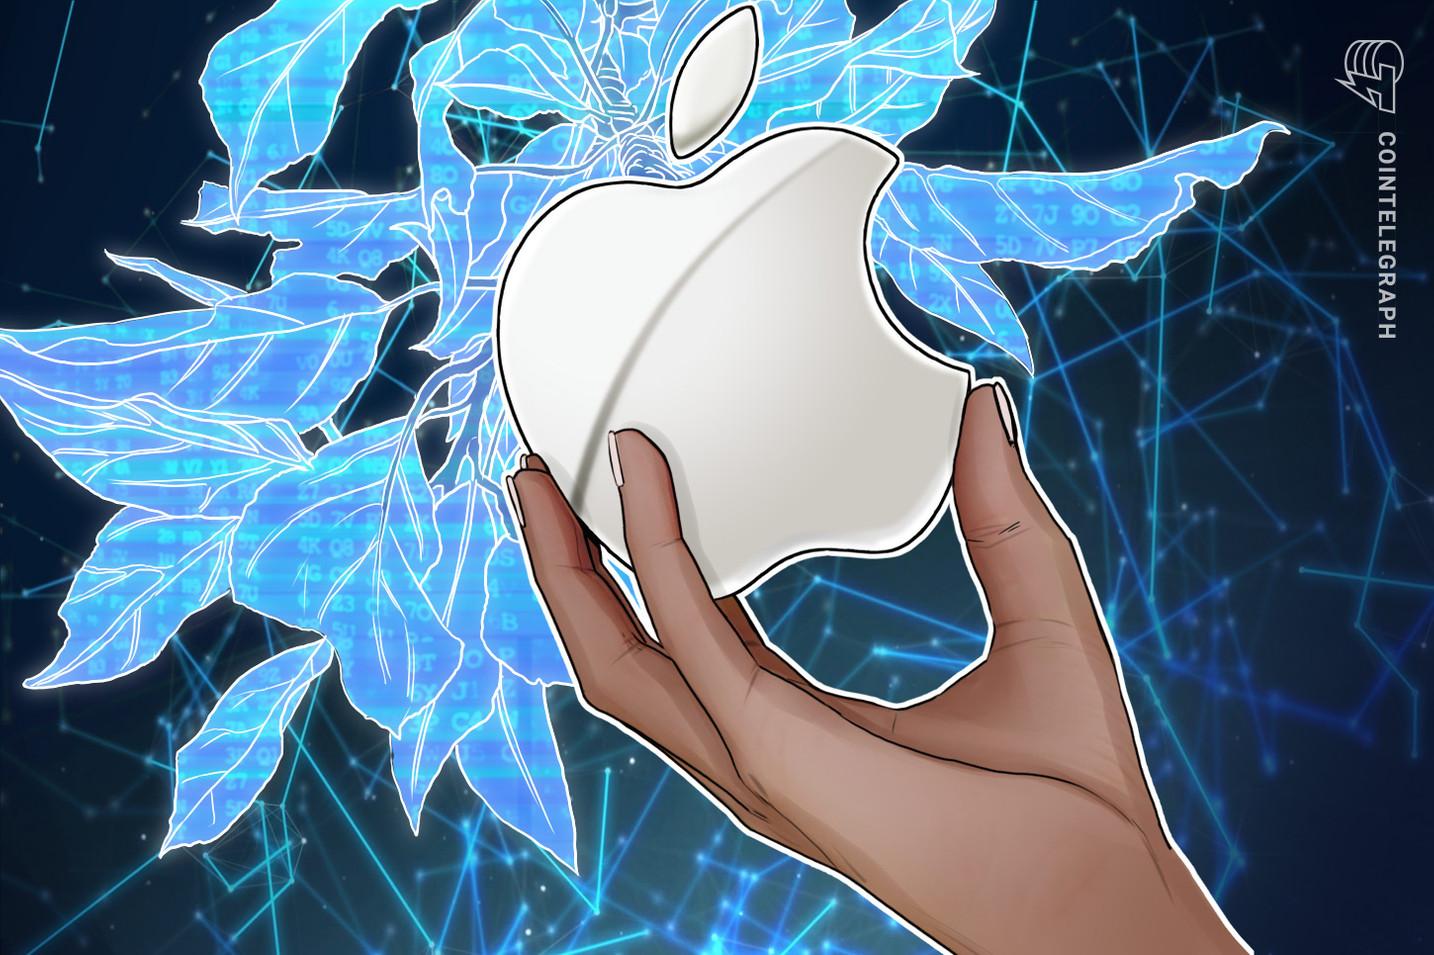 100 billion reasons Apple should get behind Bitcoin: Michael Saylor